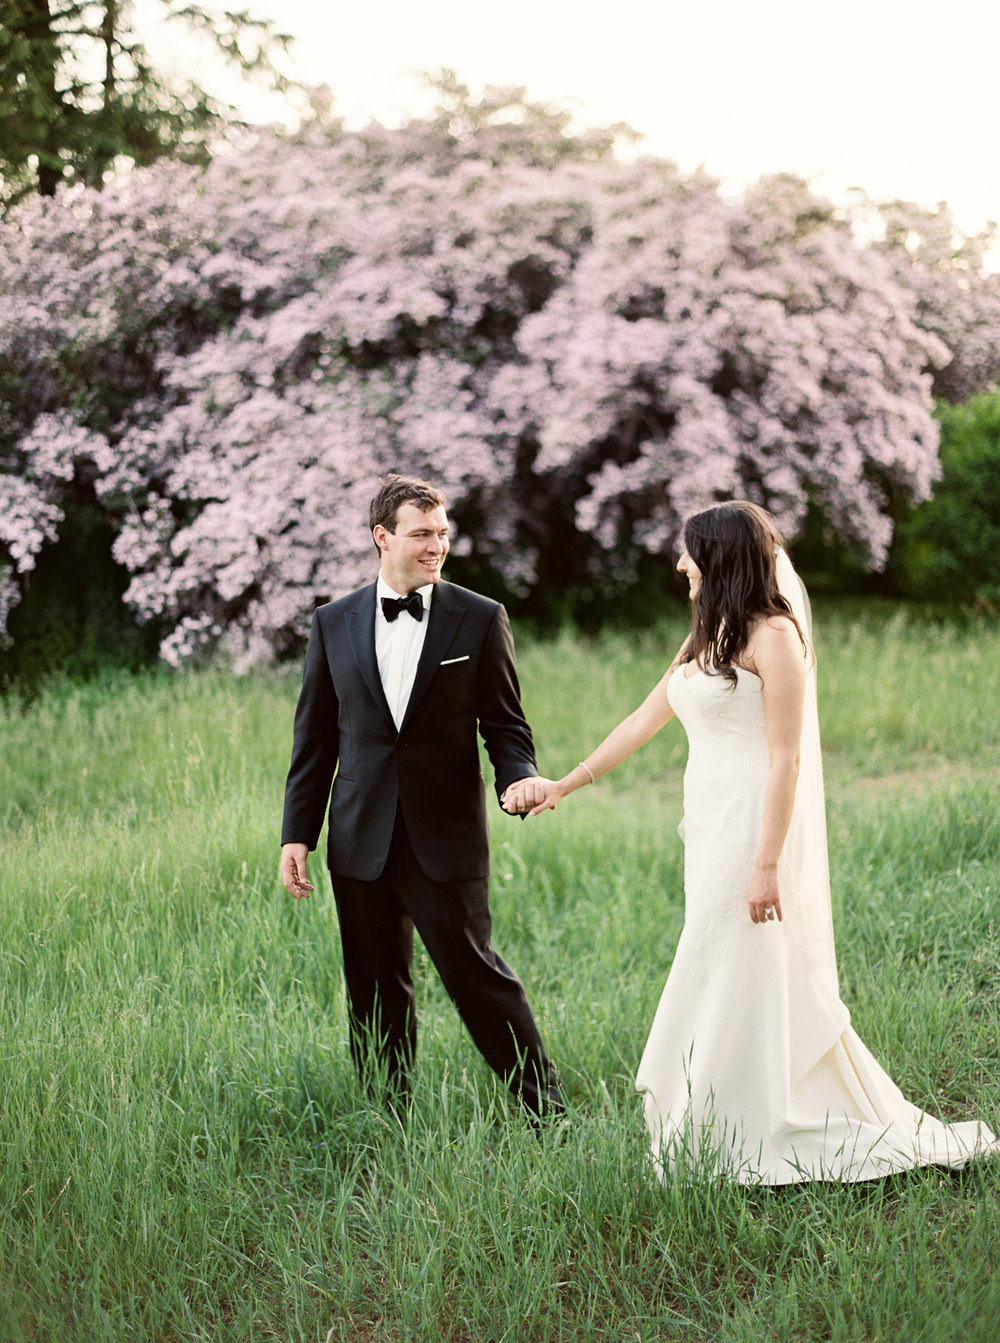 0155-Nadia-Chris-Married-When He Founf Her-Toronto Golf Club.jpg